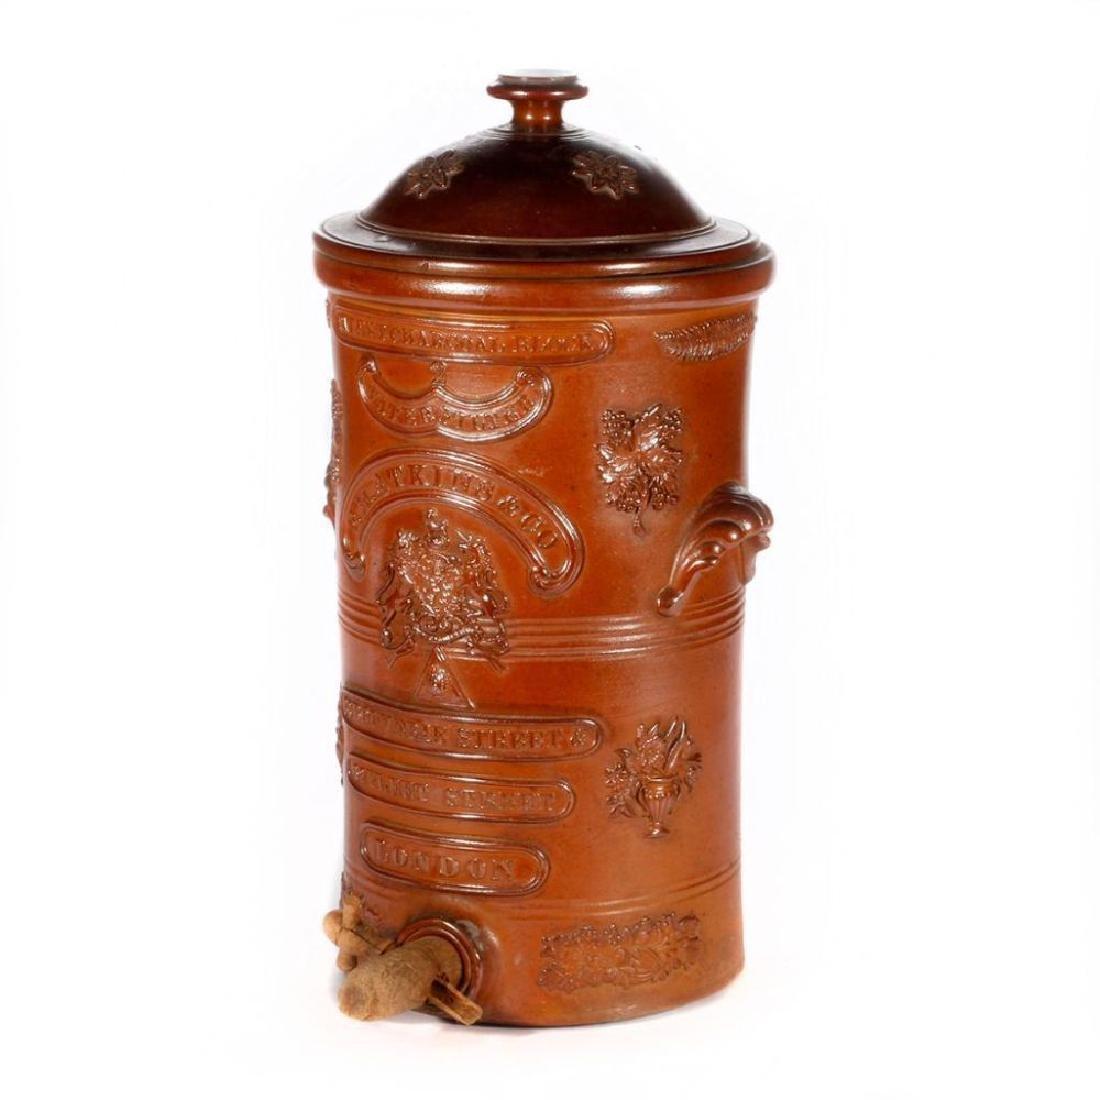 A 19th century English stoneware water barrel.